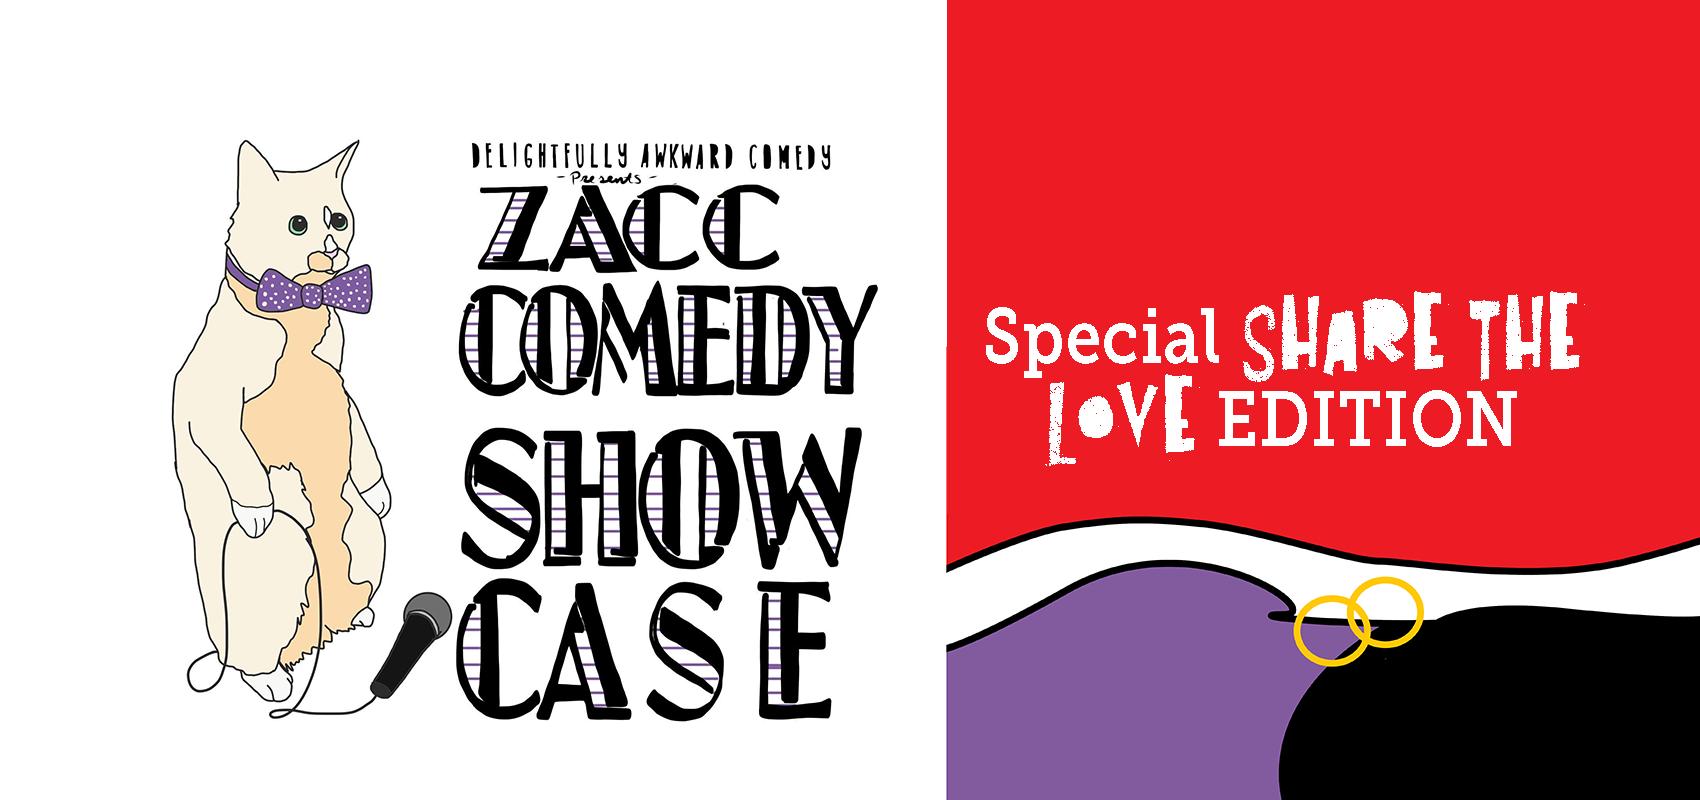 ZACC Comedy Showcase: Special Share the Love Edition